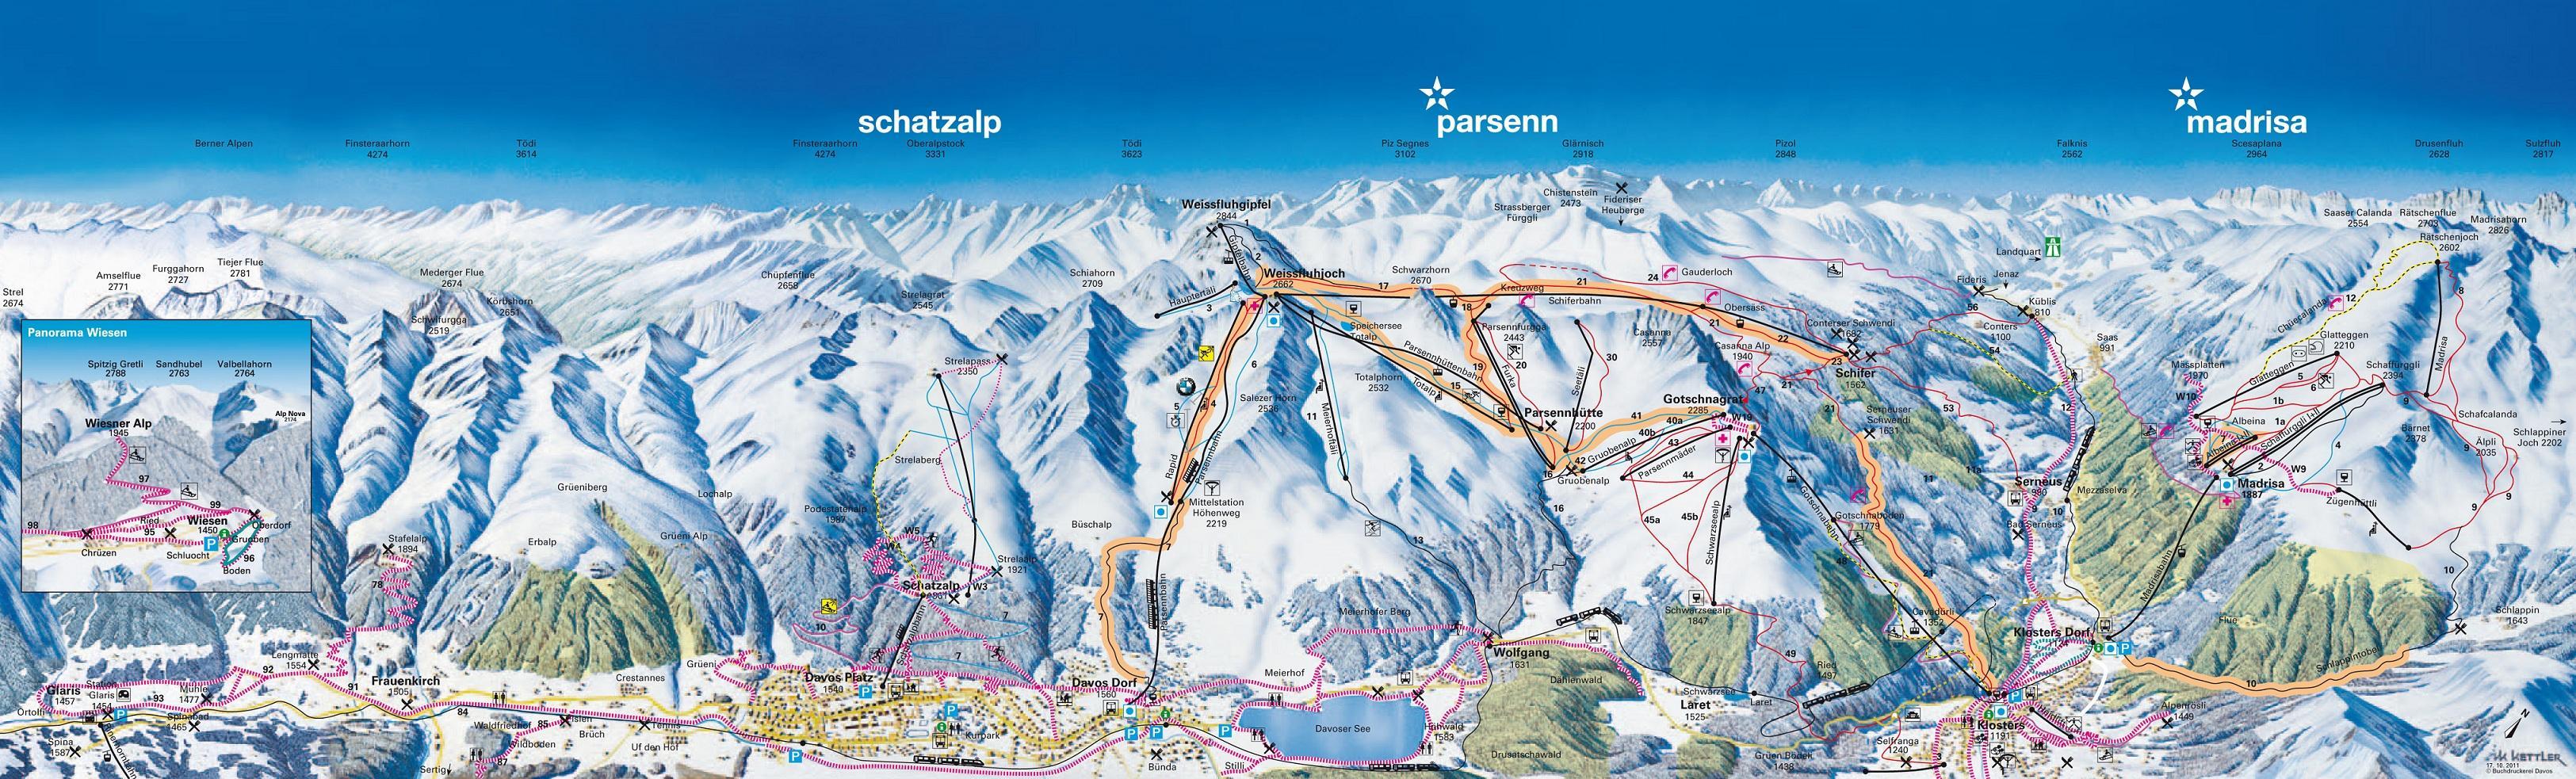 klosters__madrisa_ski_map